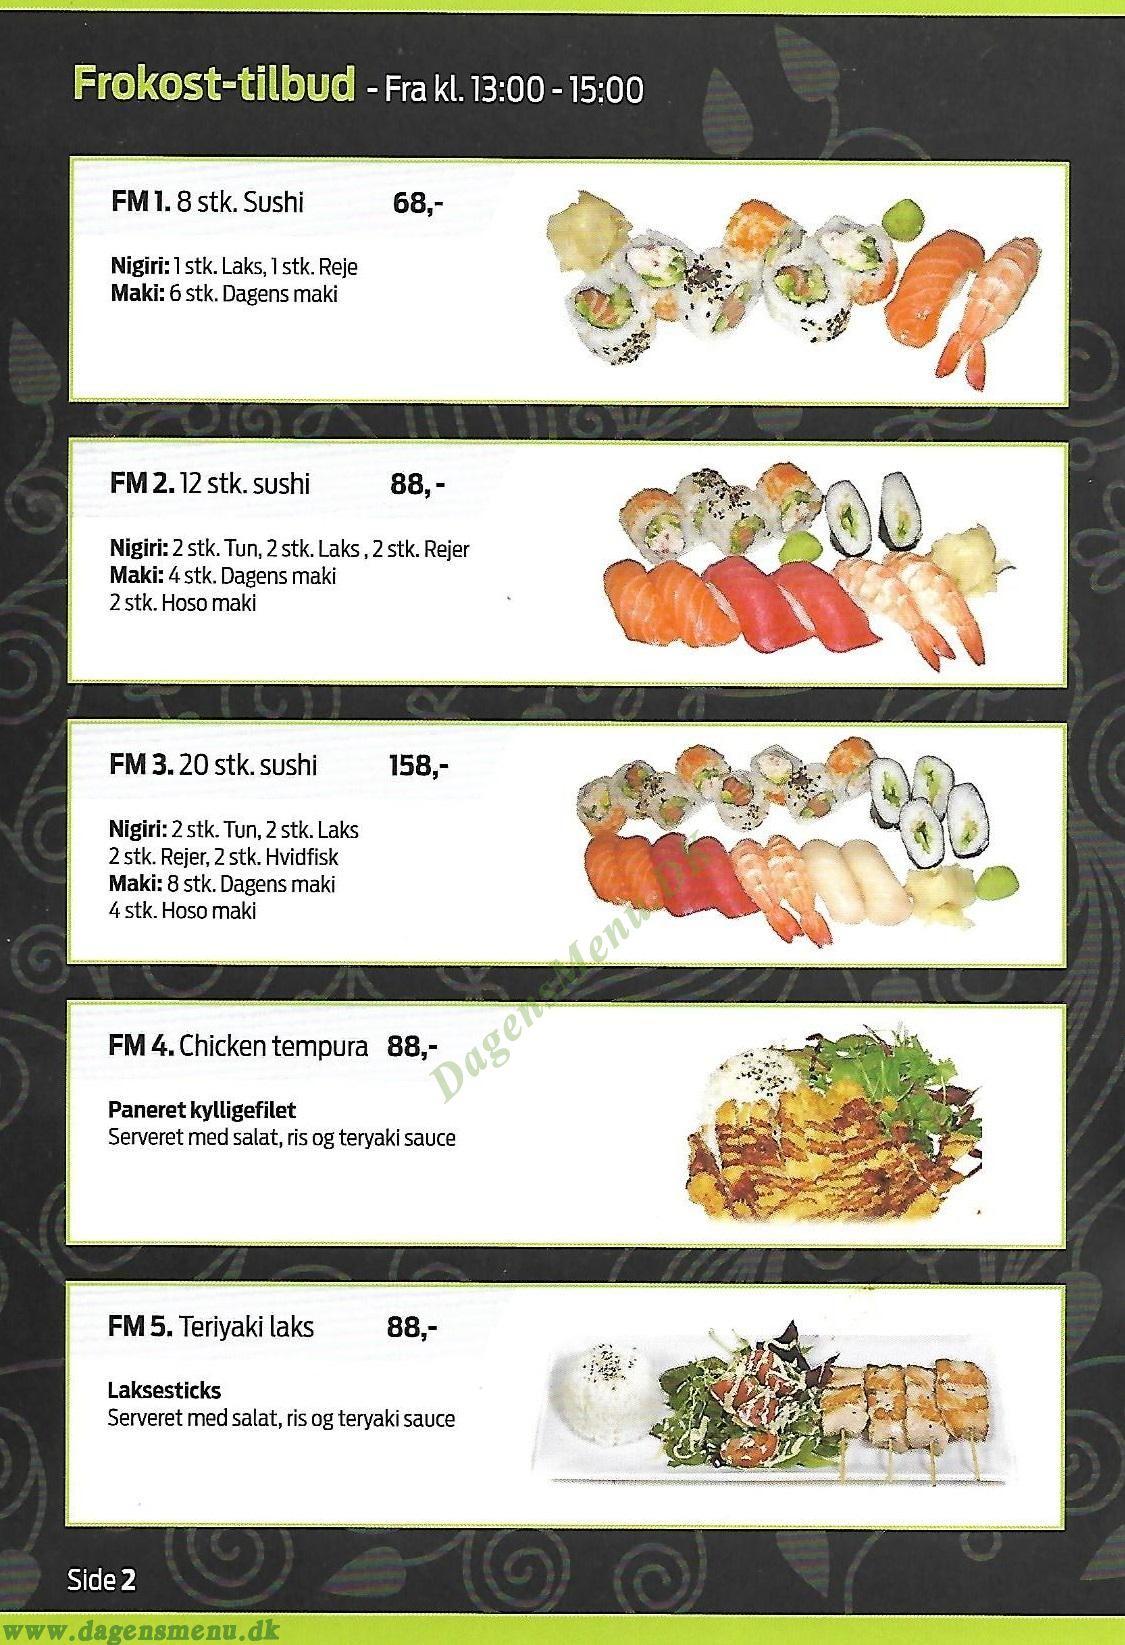 Takii sushi Nørrebro - Menukort